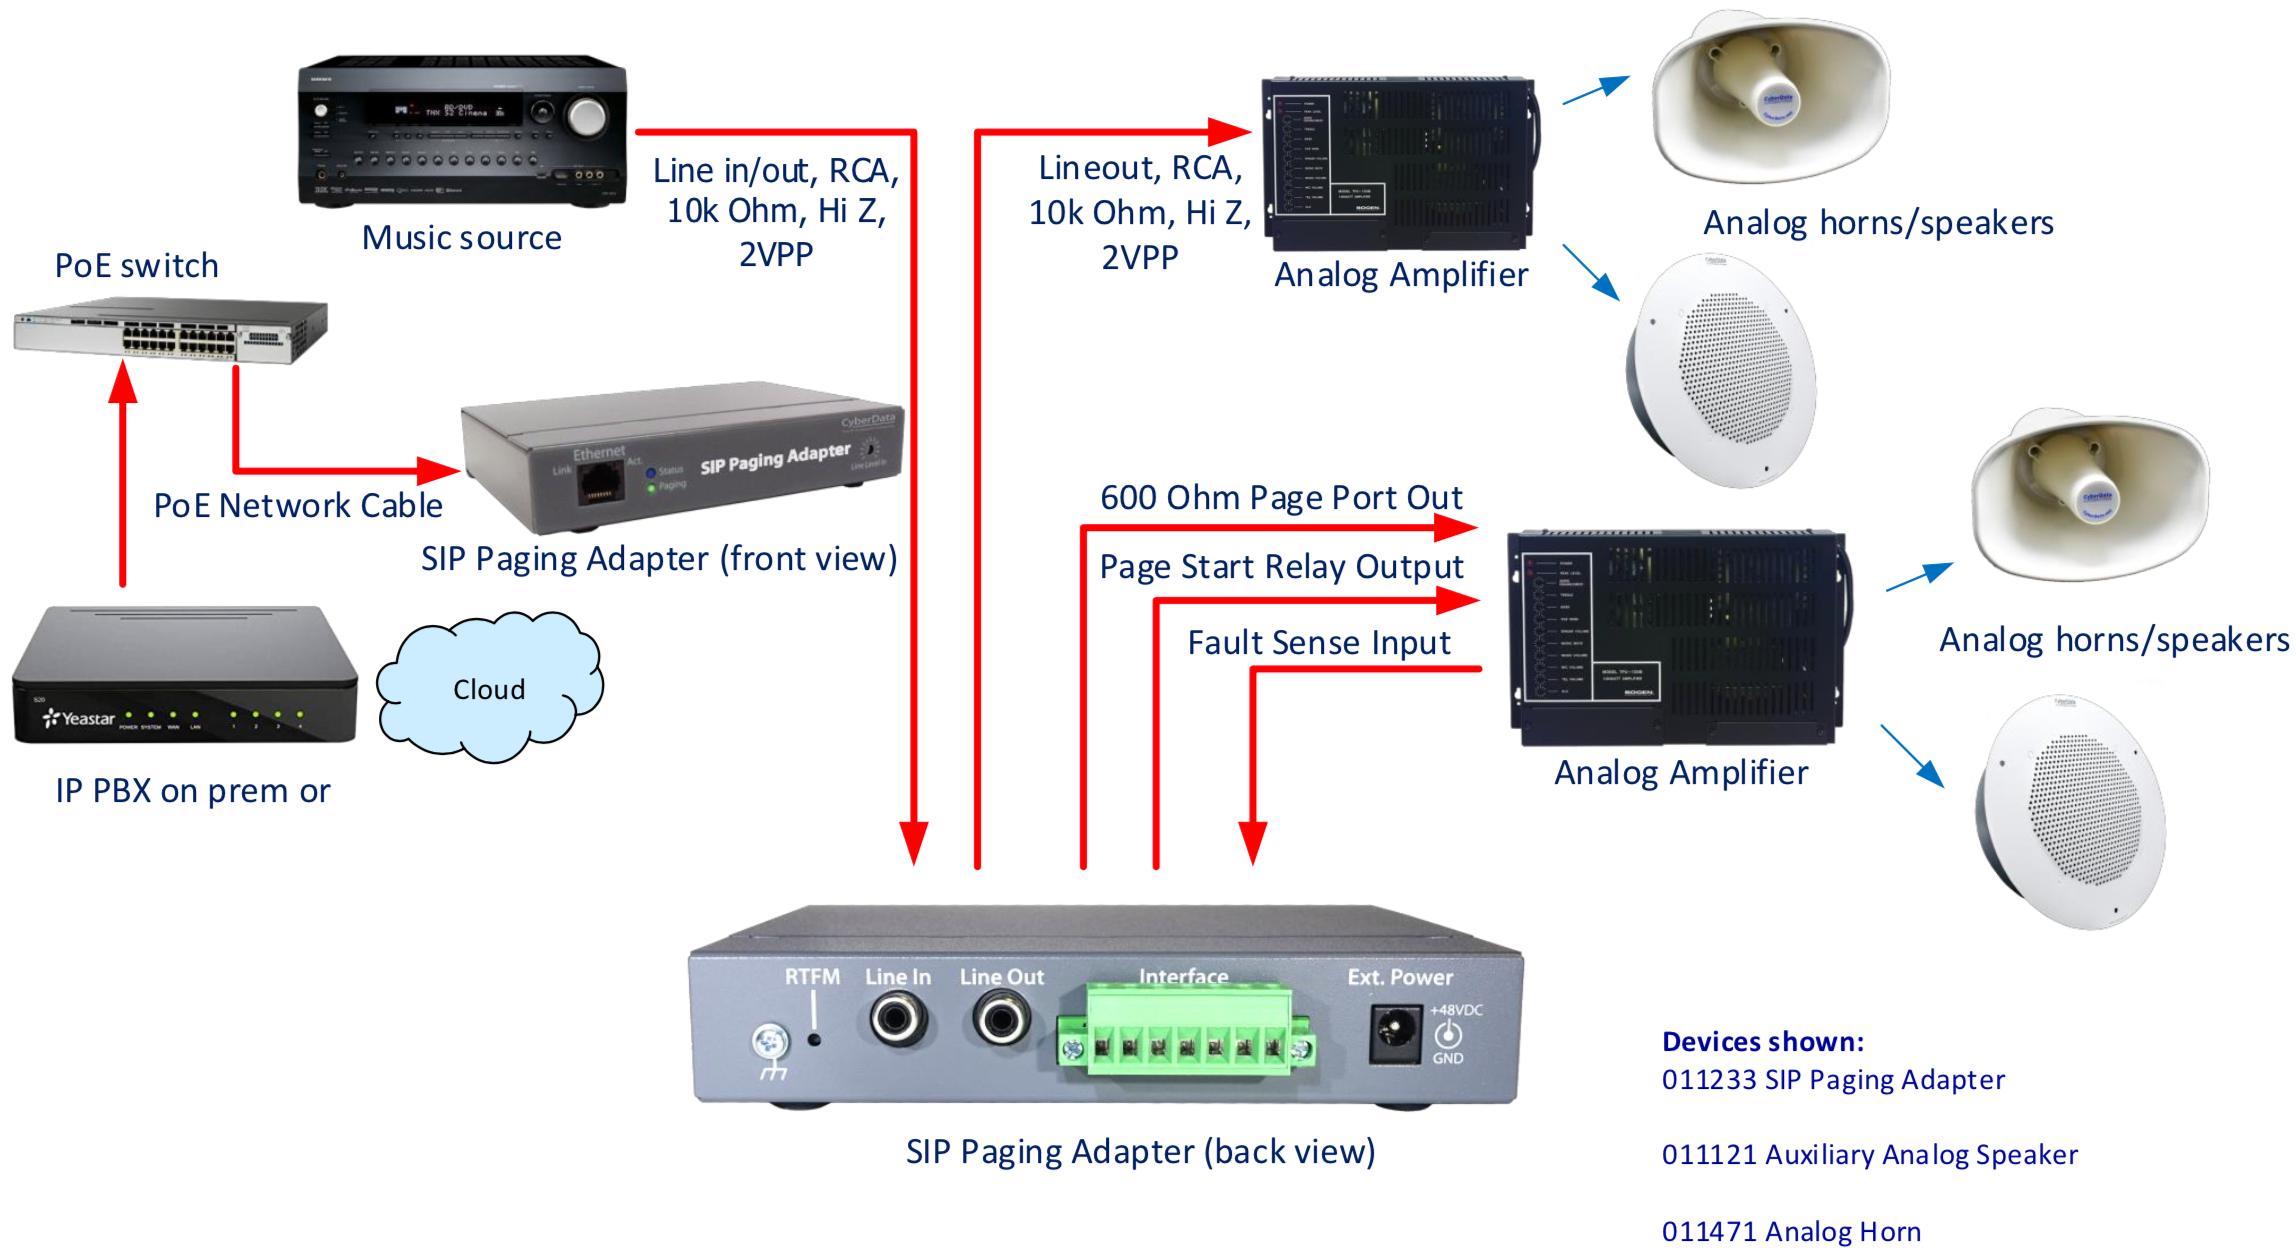 011233 Sip Paging Adapter Cyberdata Corporation